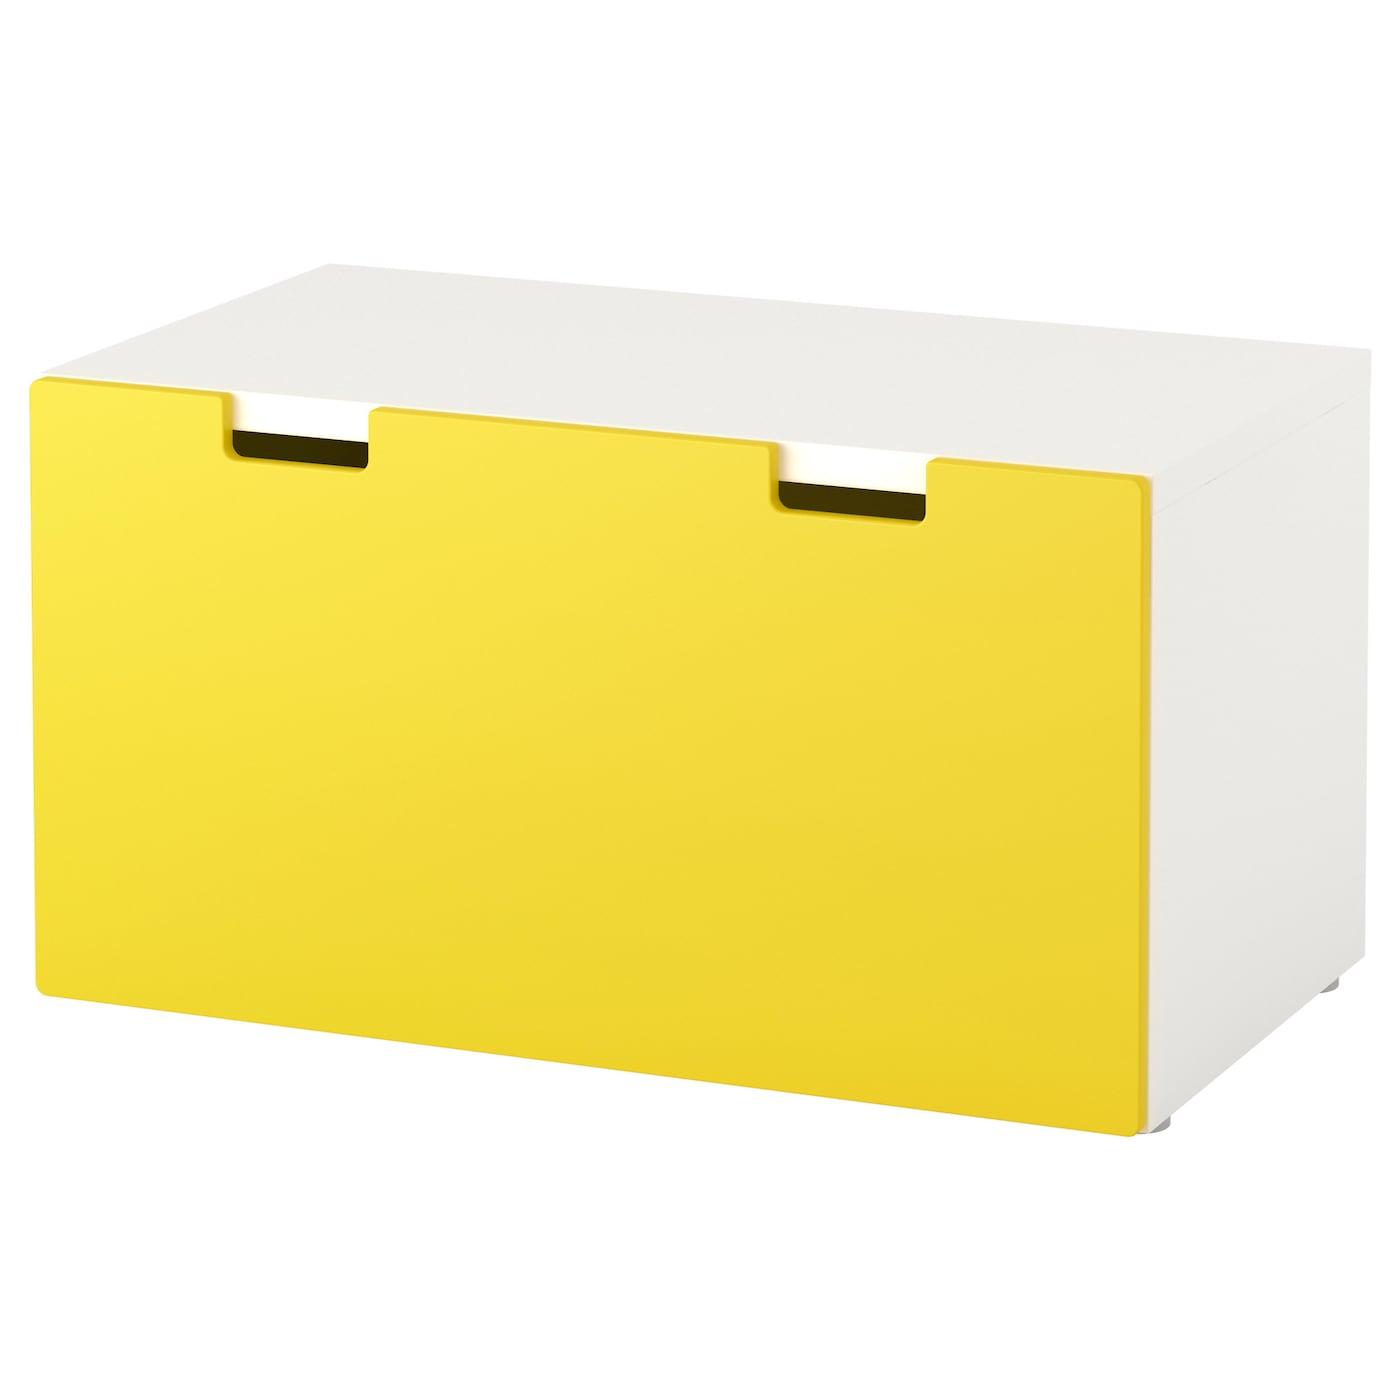 stuva banc avec rangement blanc jaune 90x50x50 cm ikea. Black Bedroom Furniture Sets. Home Design Ideas